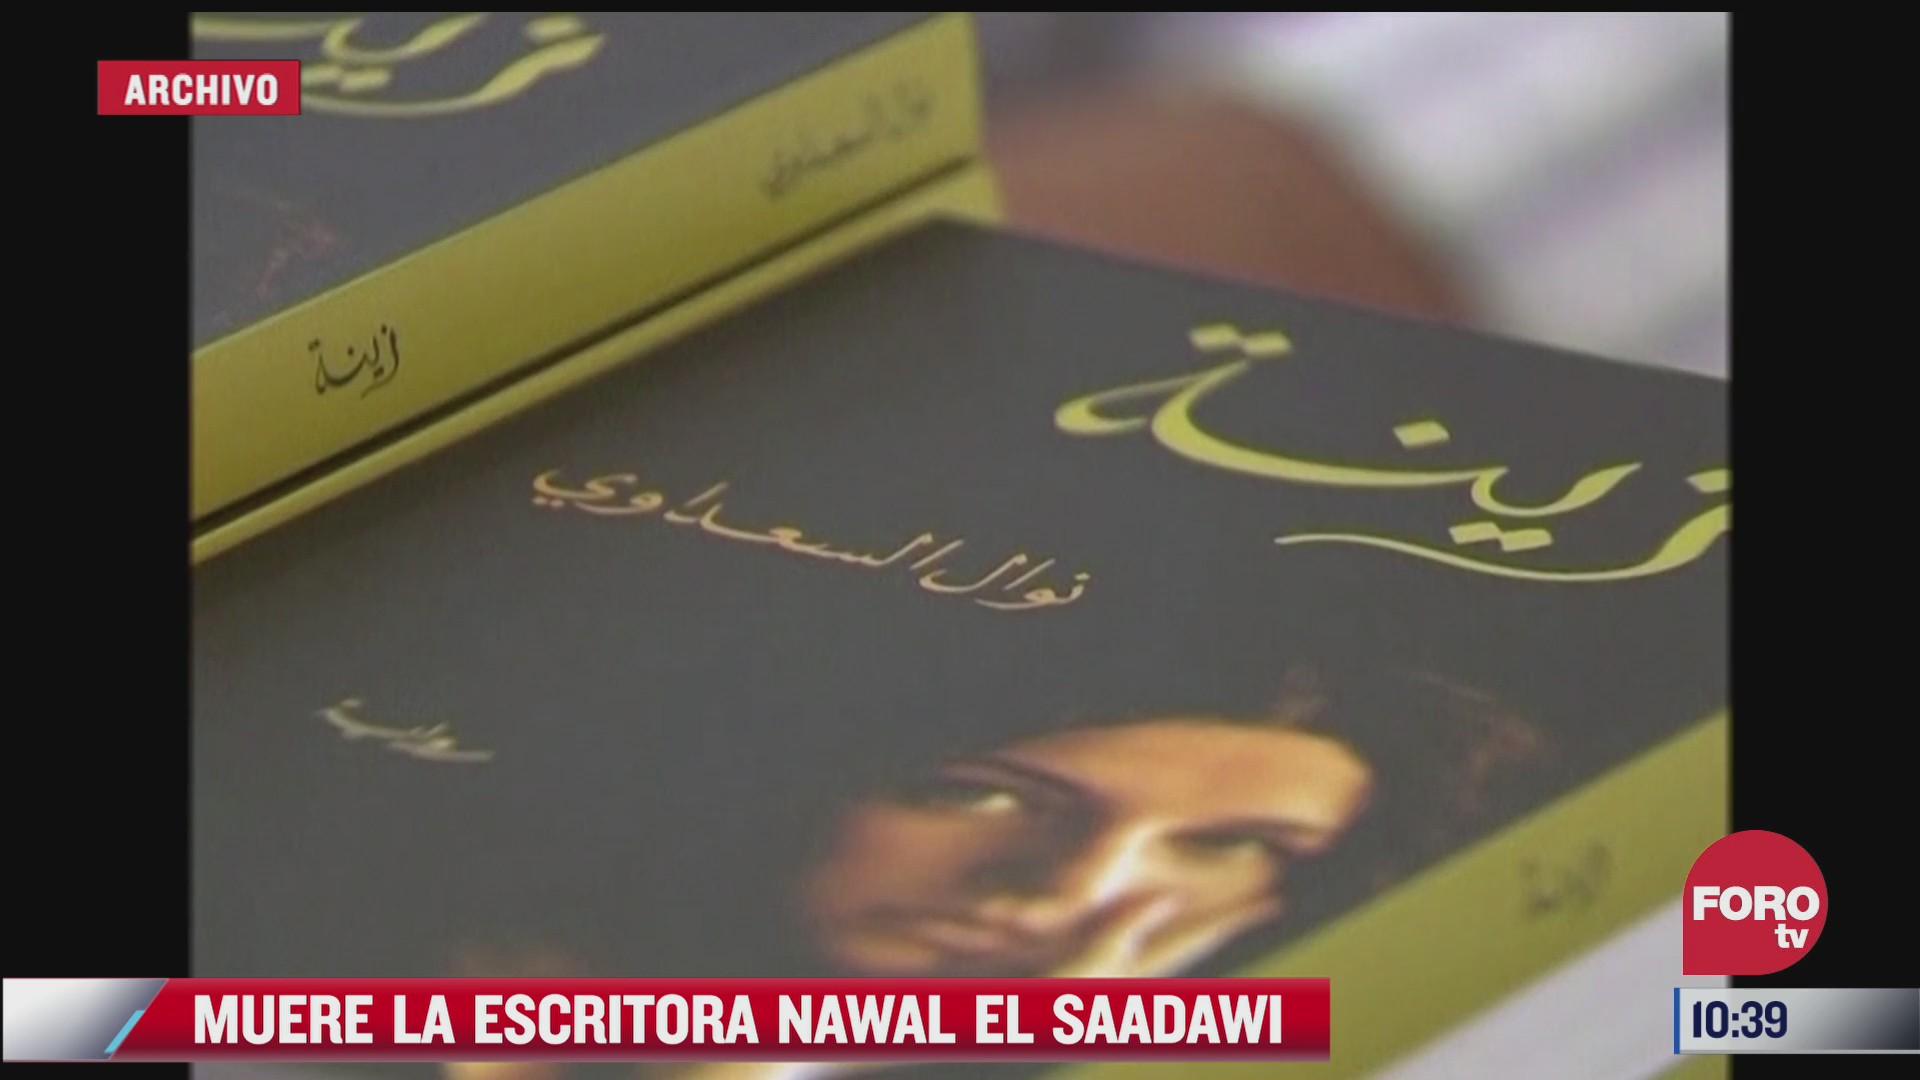 muere nawal el saadawi escritora egipcia mas influyente del siglo xx